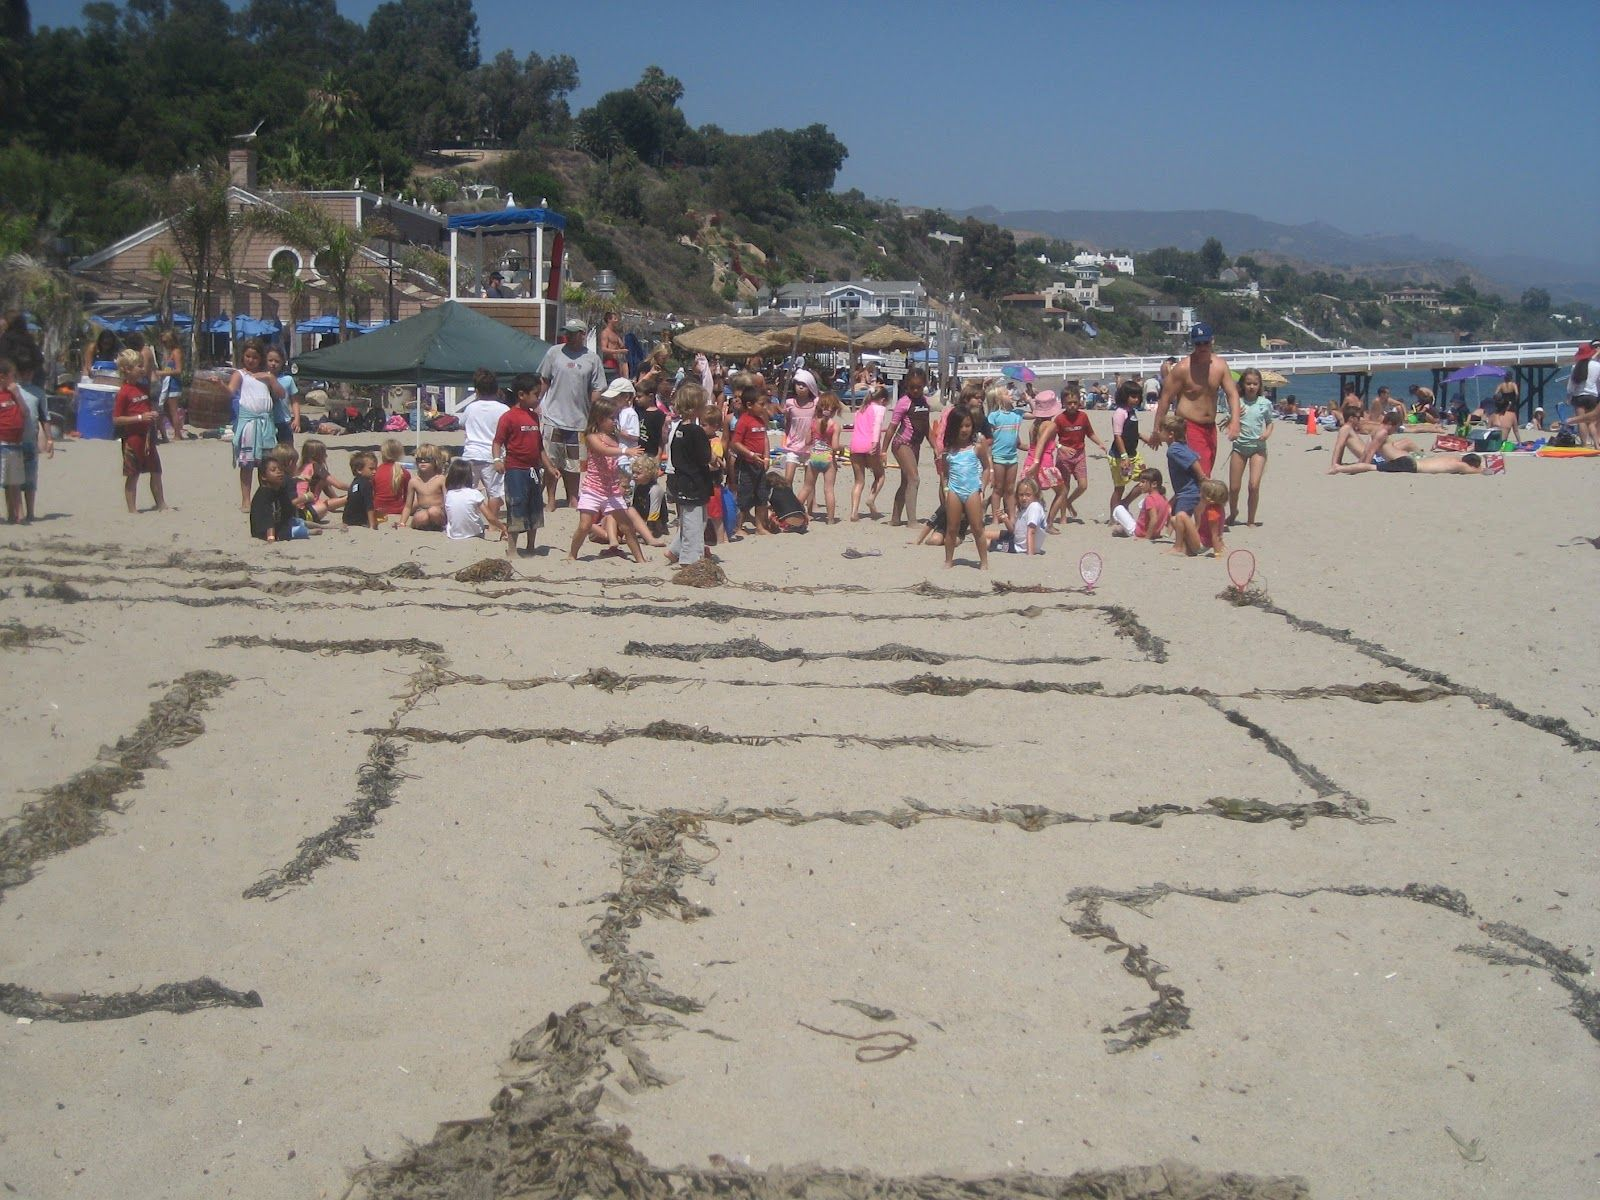 That fun beach games for teens pity